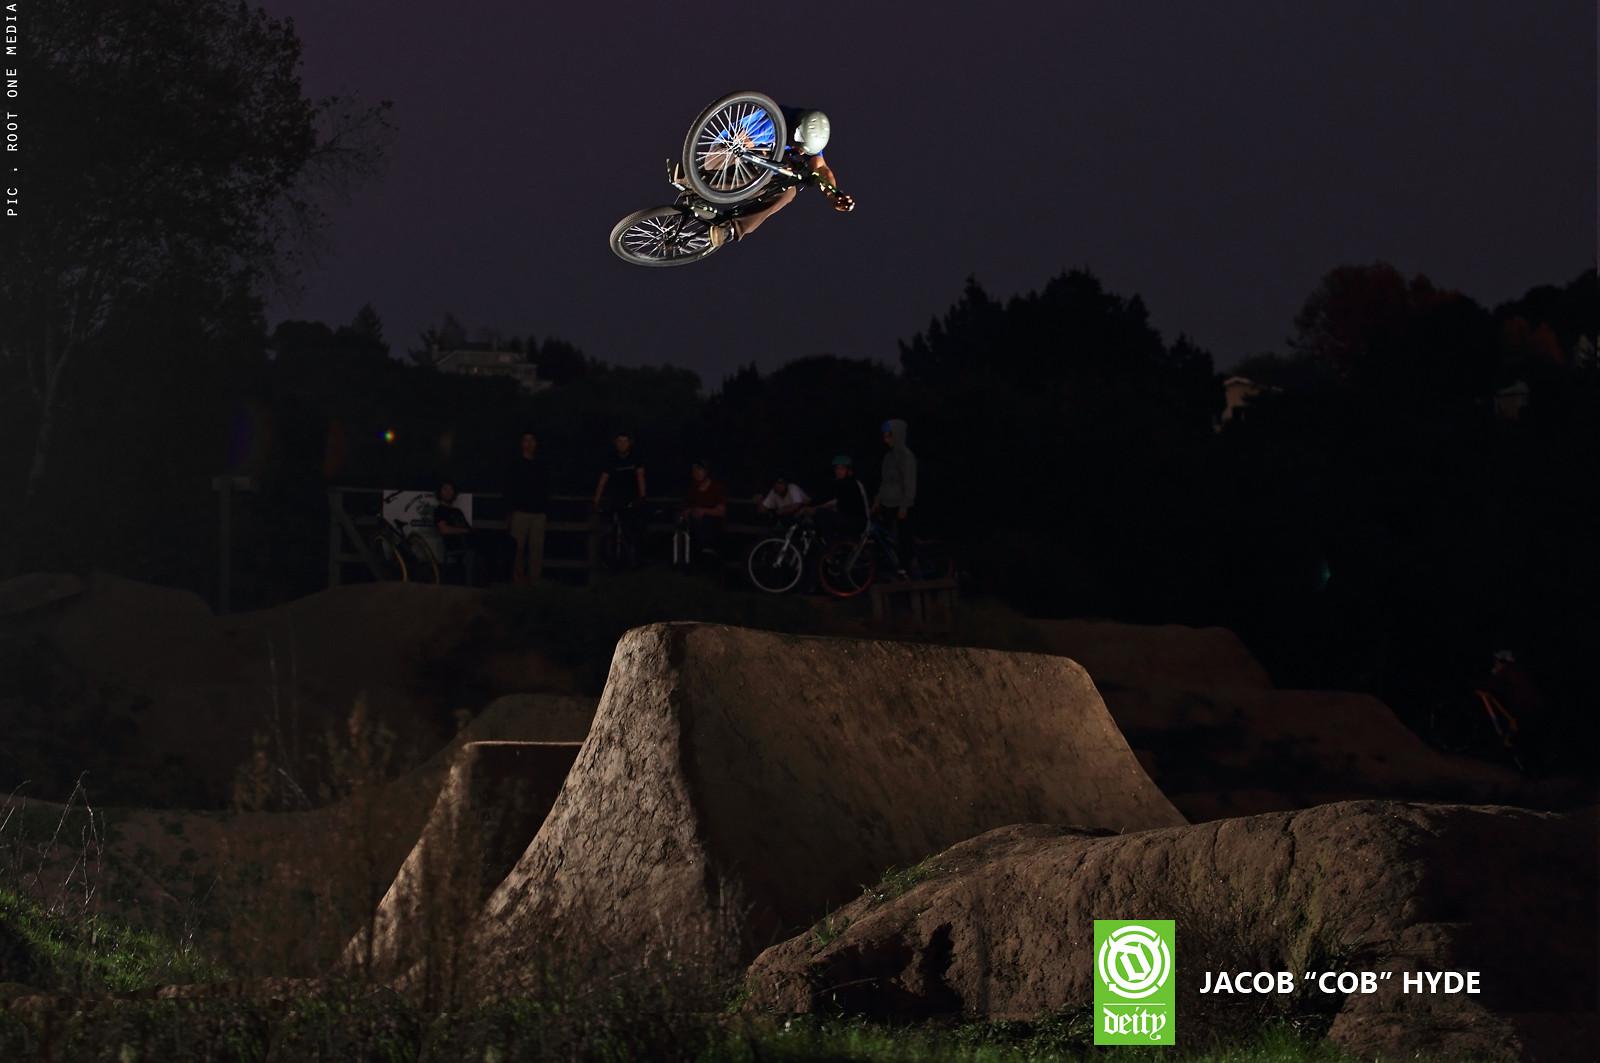 Cob Shredding The New Deity Cryptkeeper - JBrantley - Mountain Biking Pictures - Vital MTB